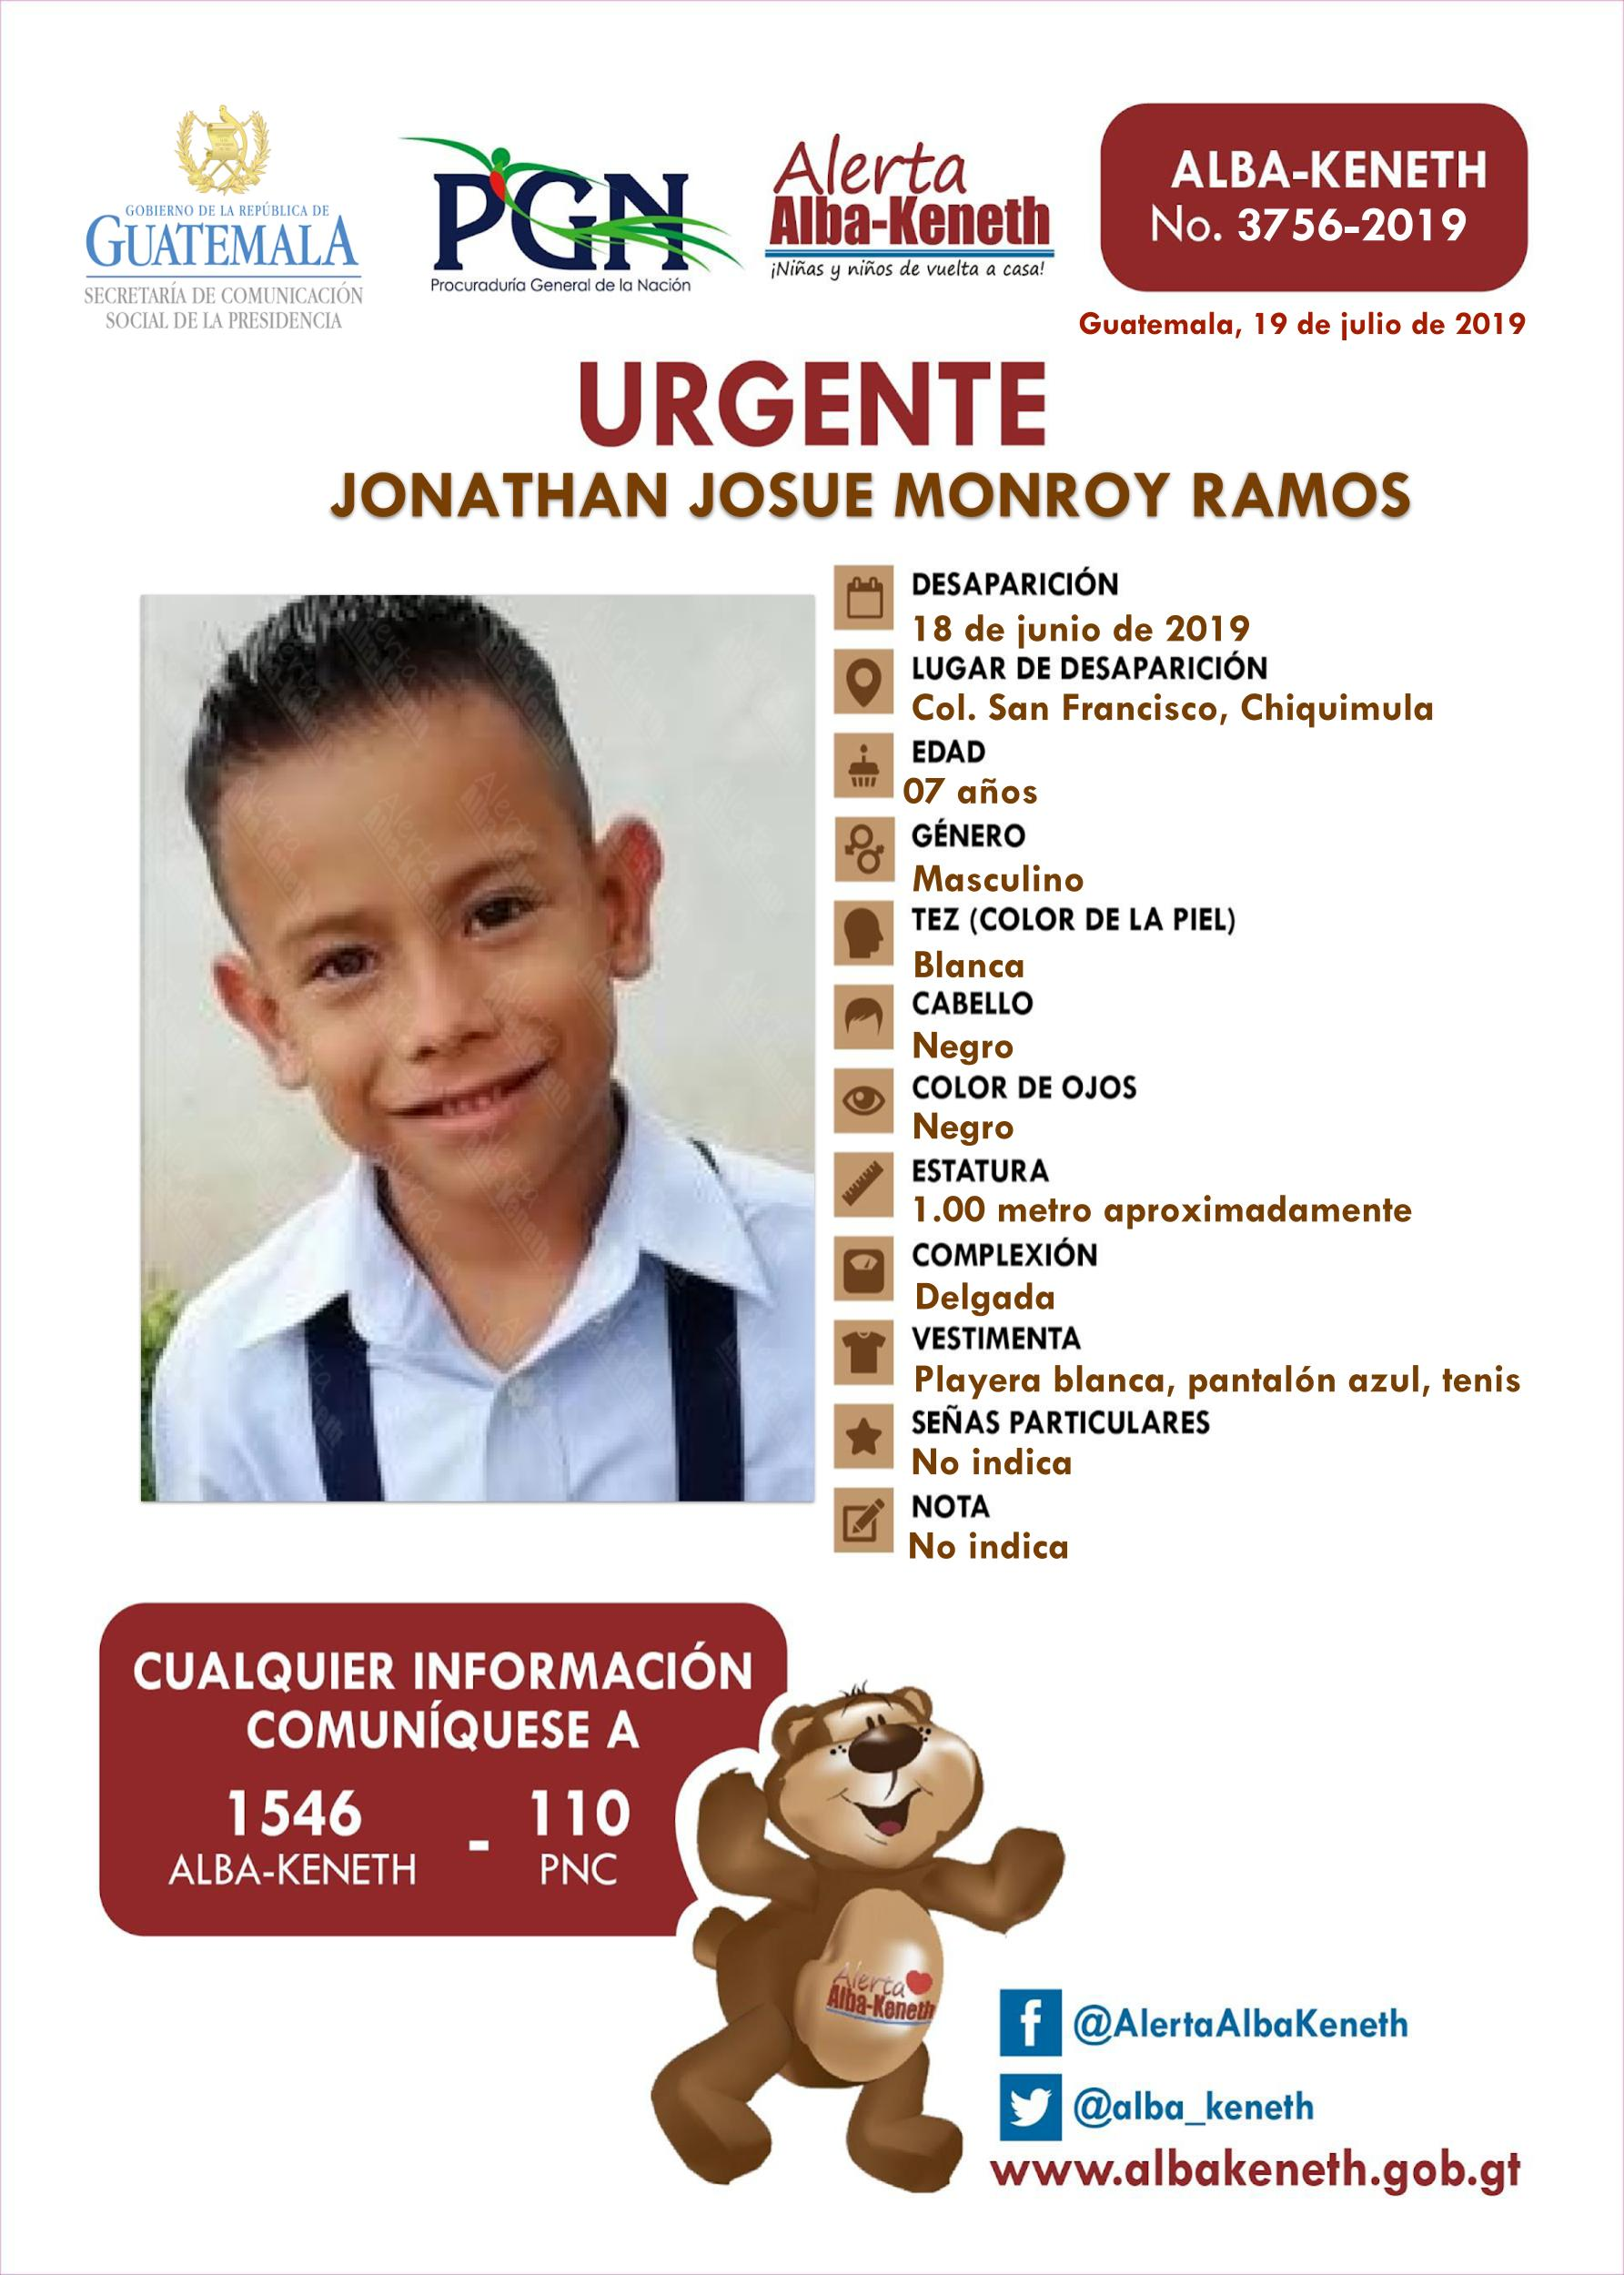 Jonathan Josue Monroy Ramos